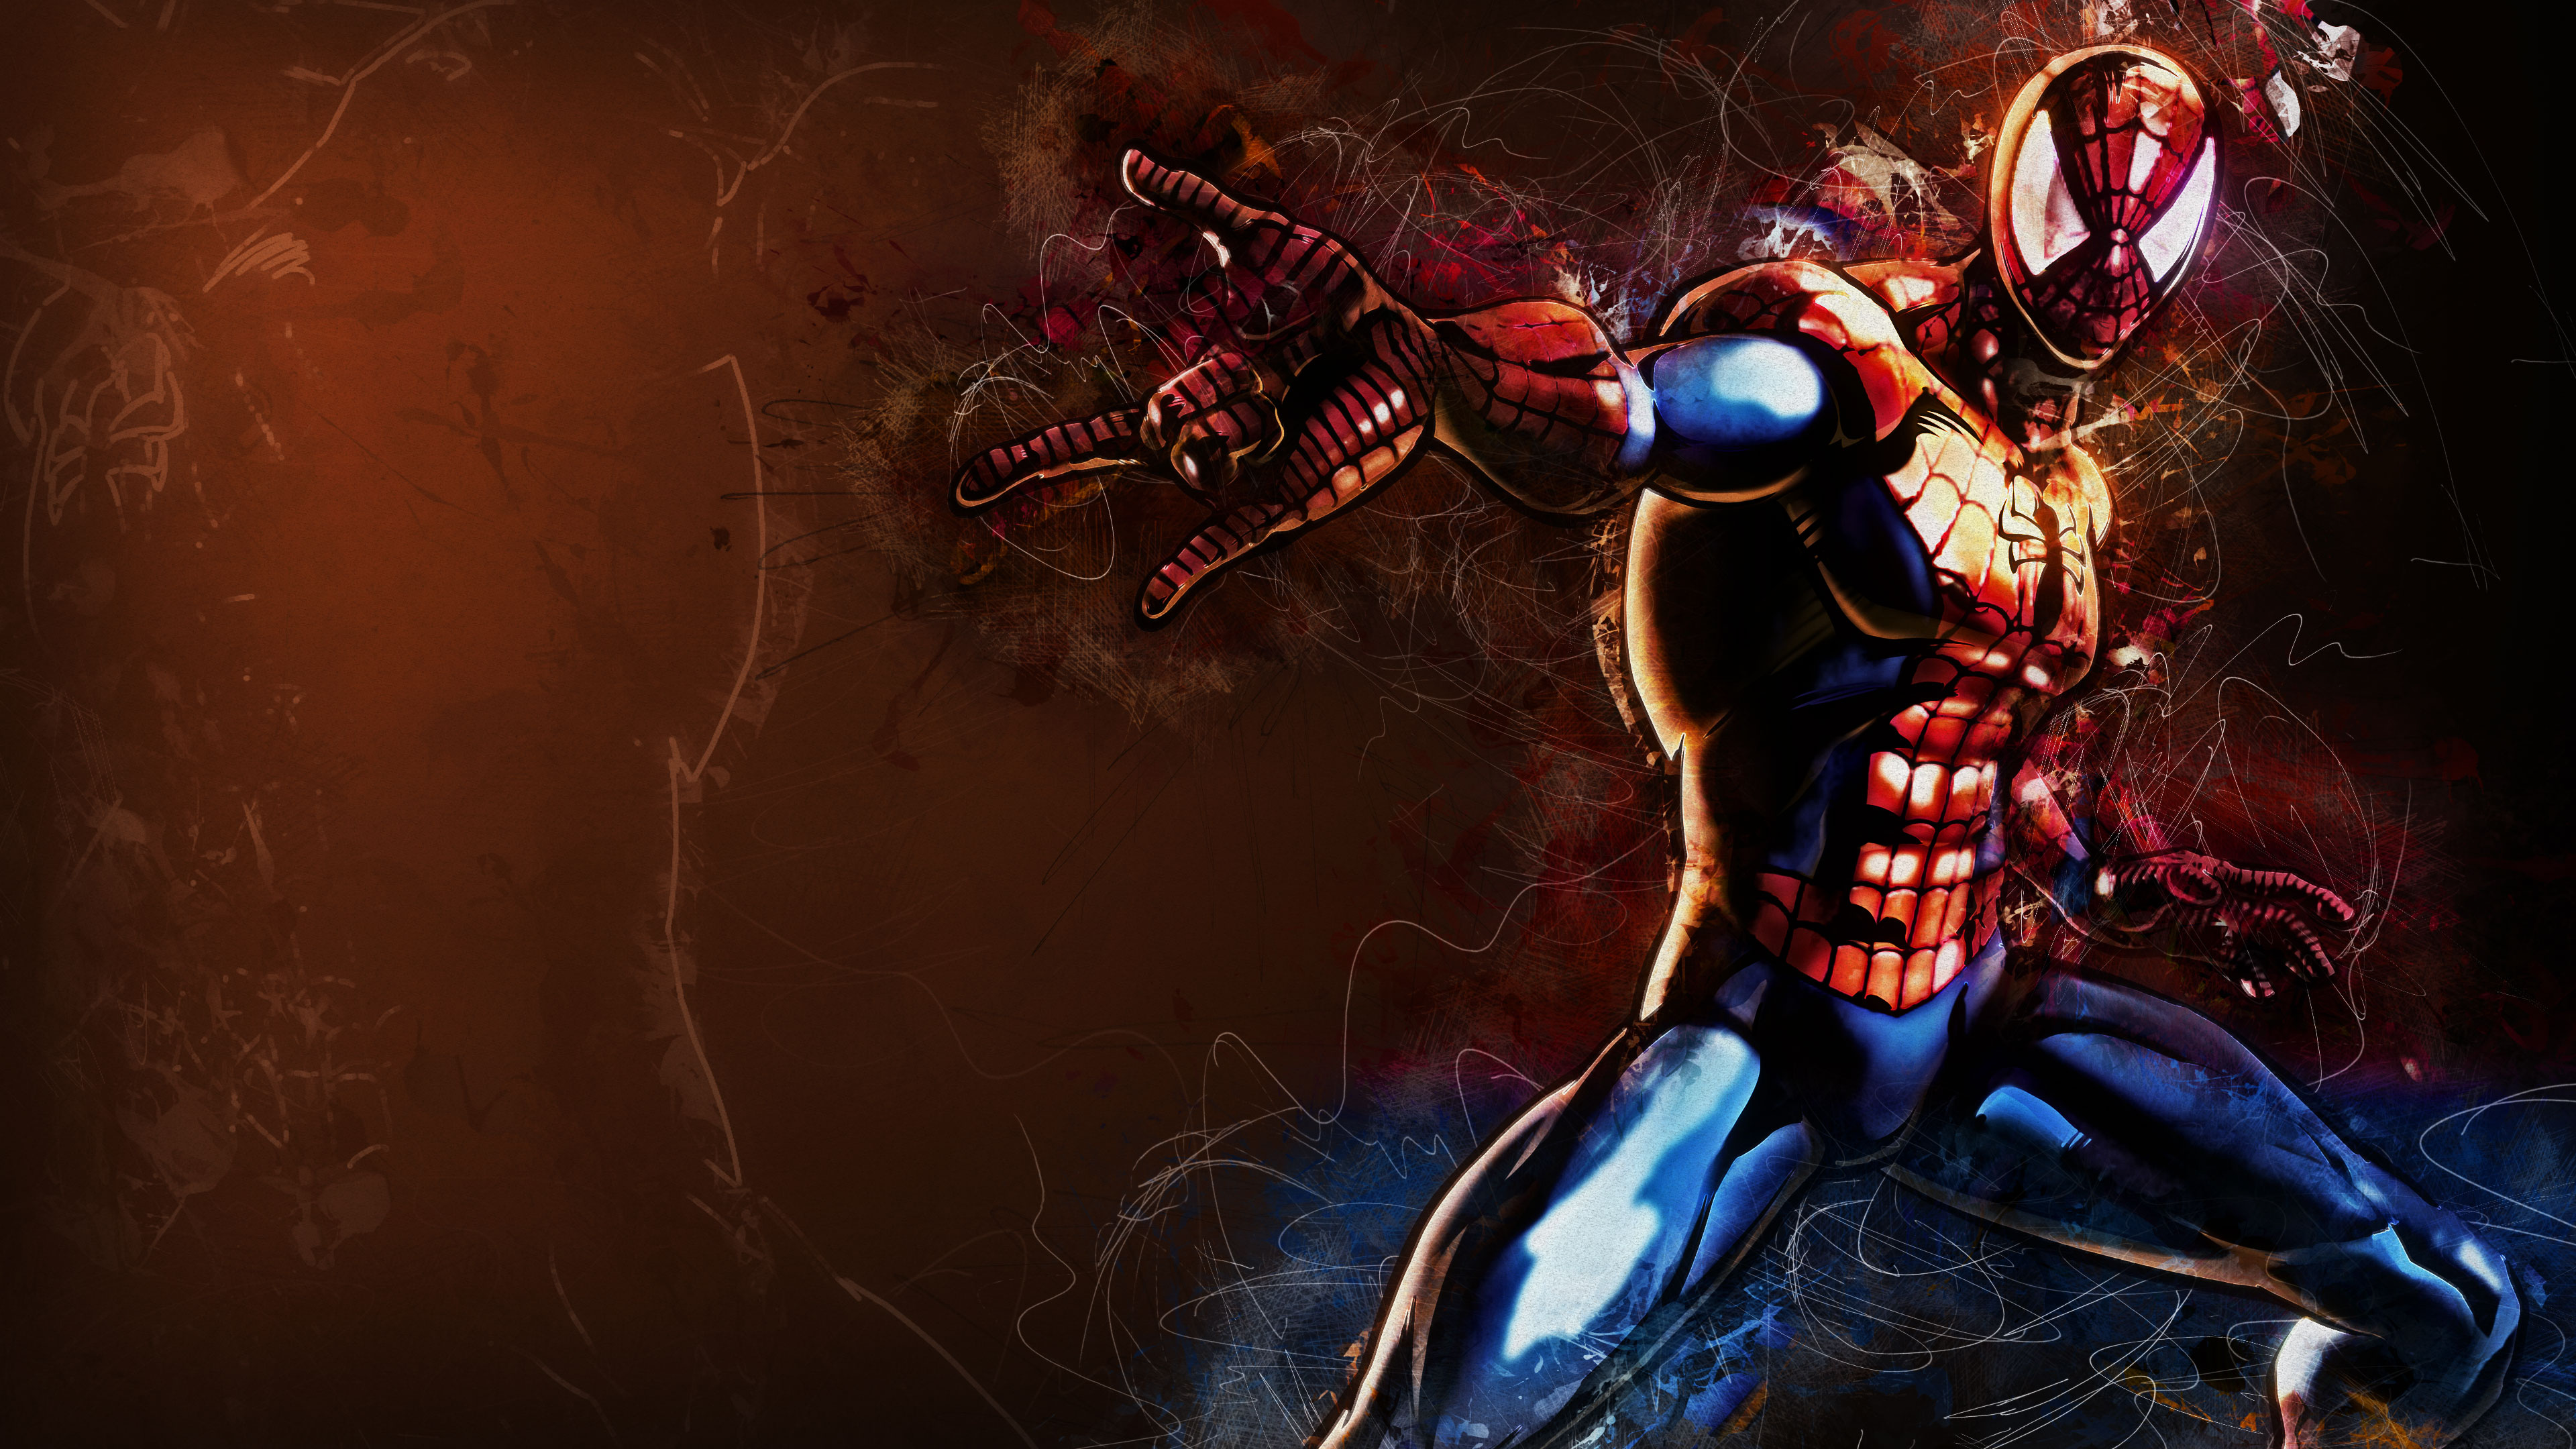 spiderman art 4k 1536521847 - Spiderman Art 4k - superheroes wallpapers, spiderman wallpapers, hd-wallpapers, digital art wallpapers, artwork wallpapers, 4k-wallpapers